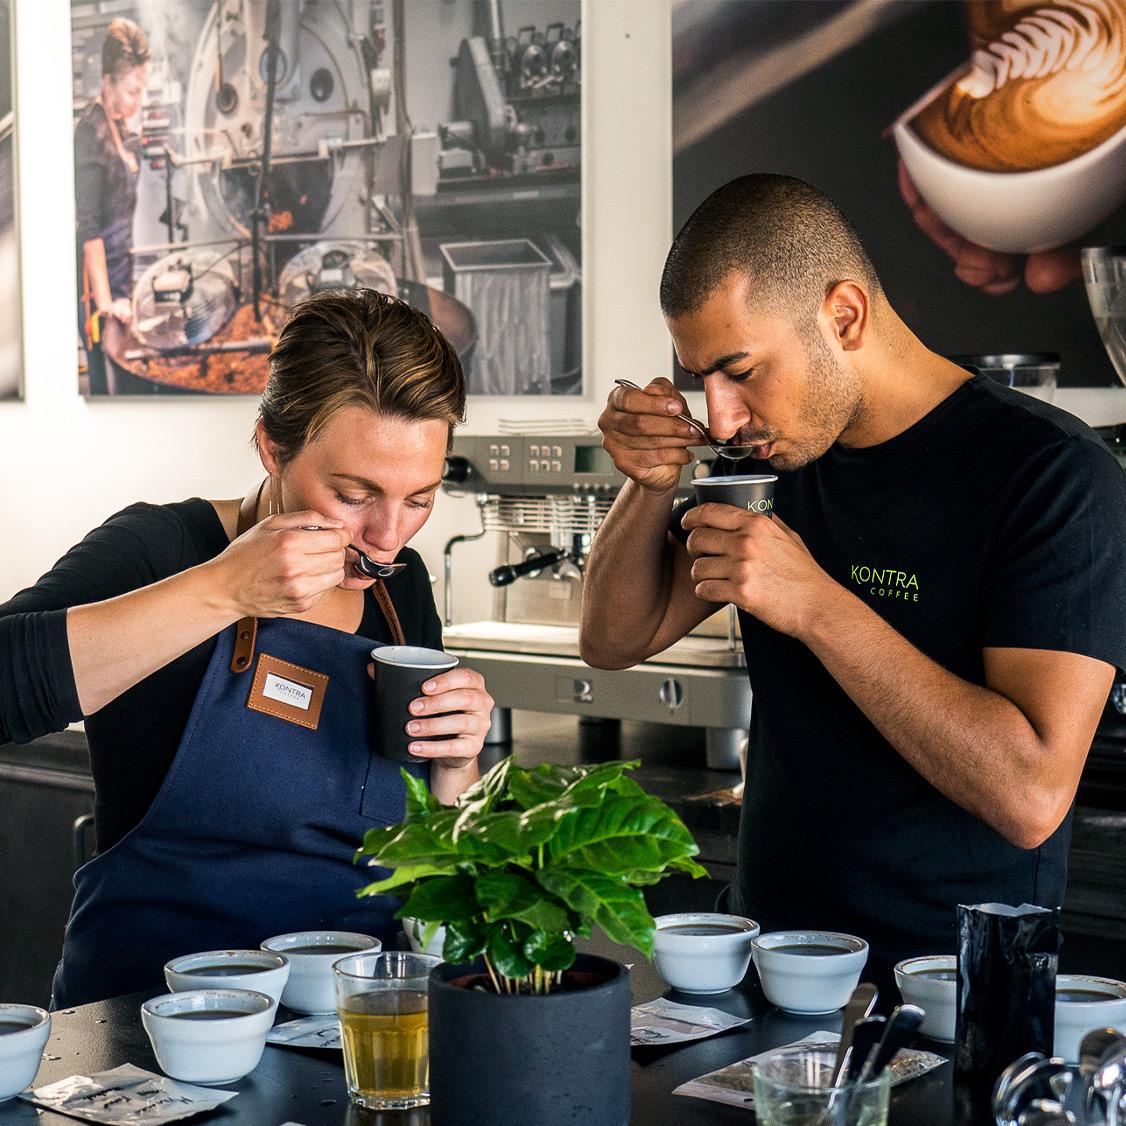 Kaffekursus hos Kontra Coffee